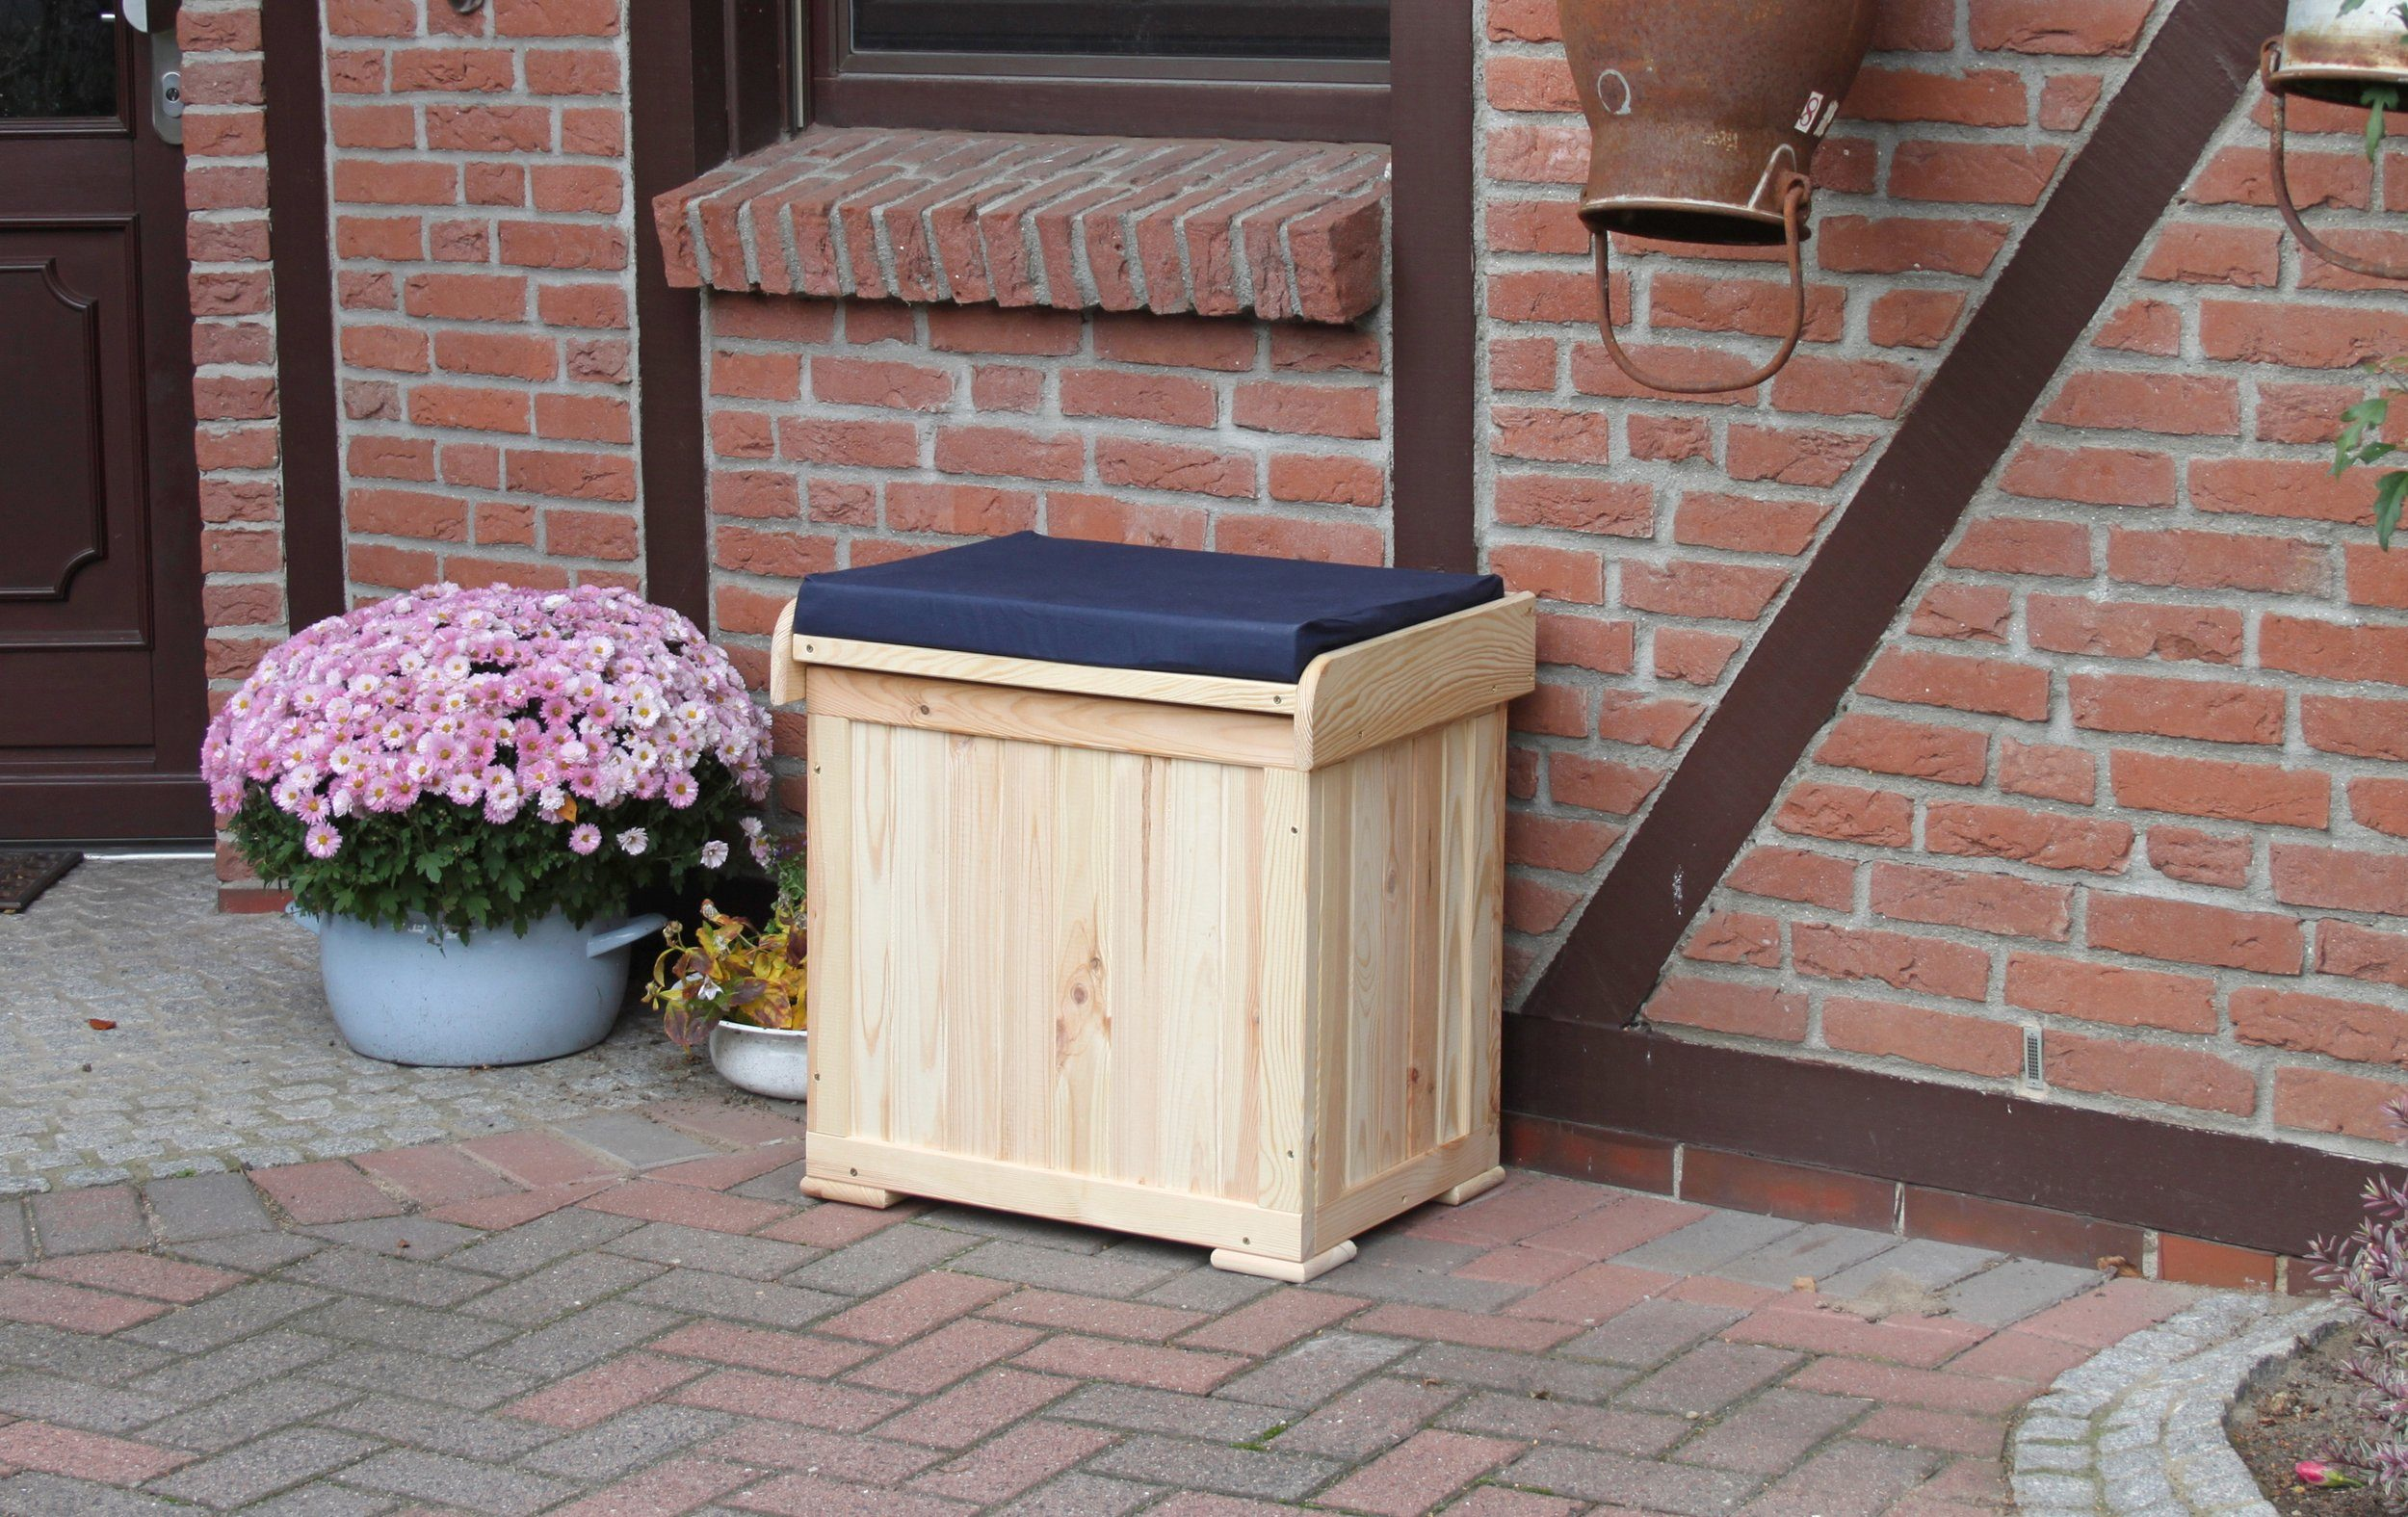 PROMADINO Kissenbox »Patrick«, mit blauer Sitzauflage, BxTxH: 53x43x56 cm